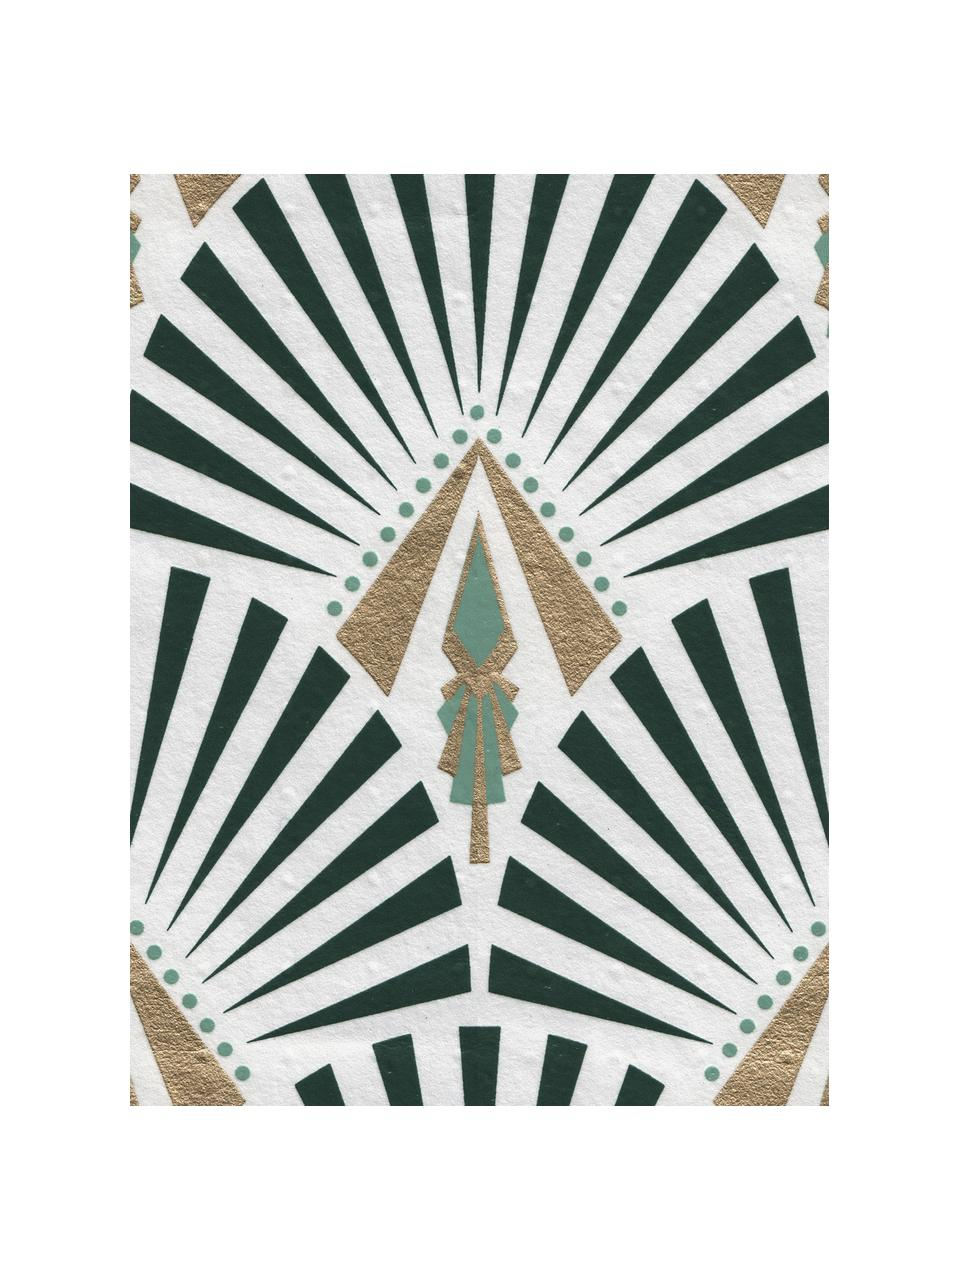 Carta da parati Luxus Geometric Art, Tessuto non tessuto, Bianco, verde, verde scuro, dorato, Larg. 52 x Alt. 1005 cm